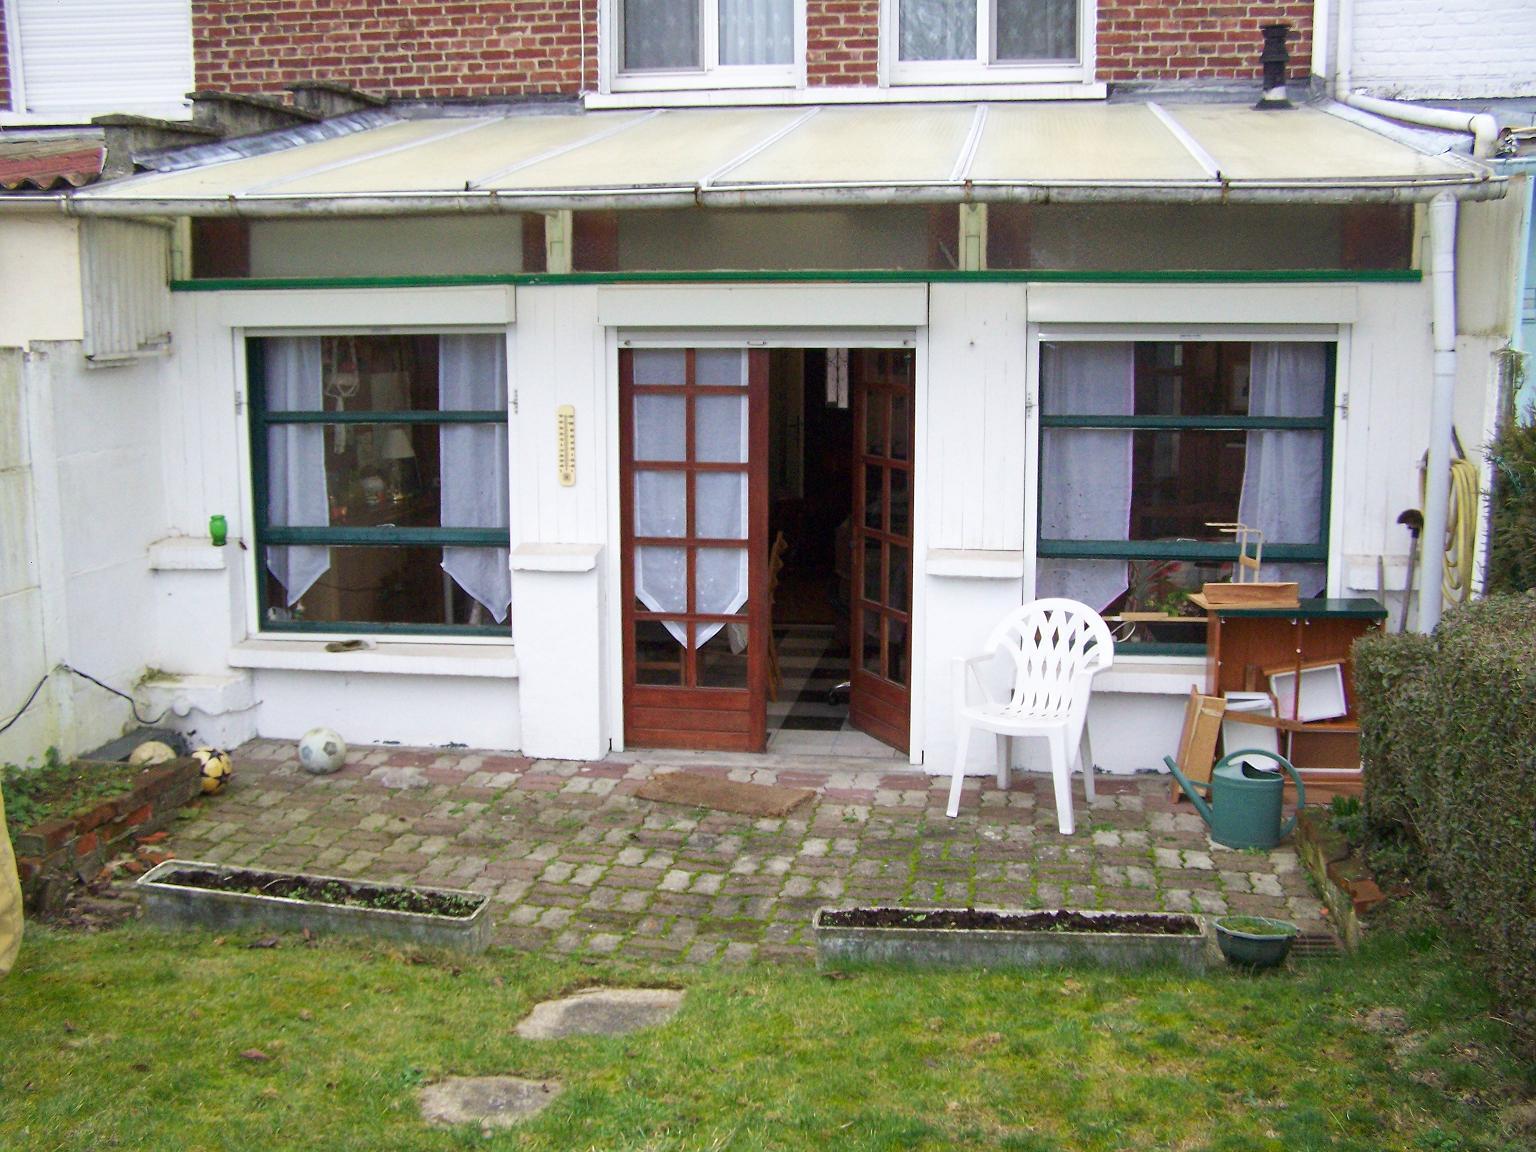 Monter un mur avec baie vitr e - Monter sa veranda soi meme ...